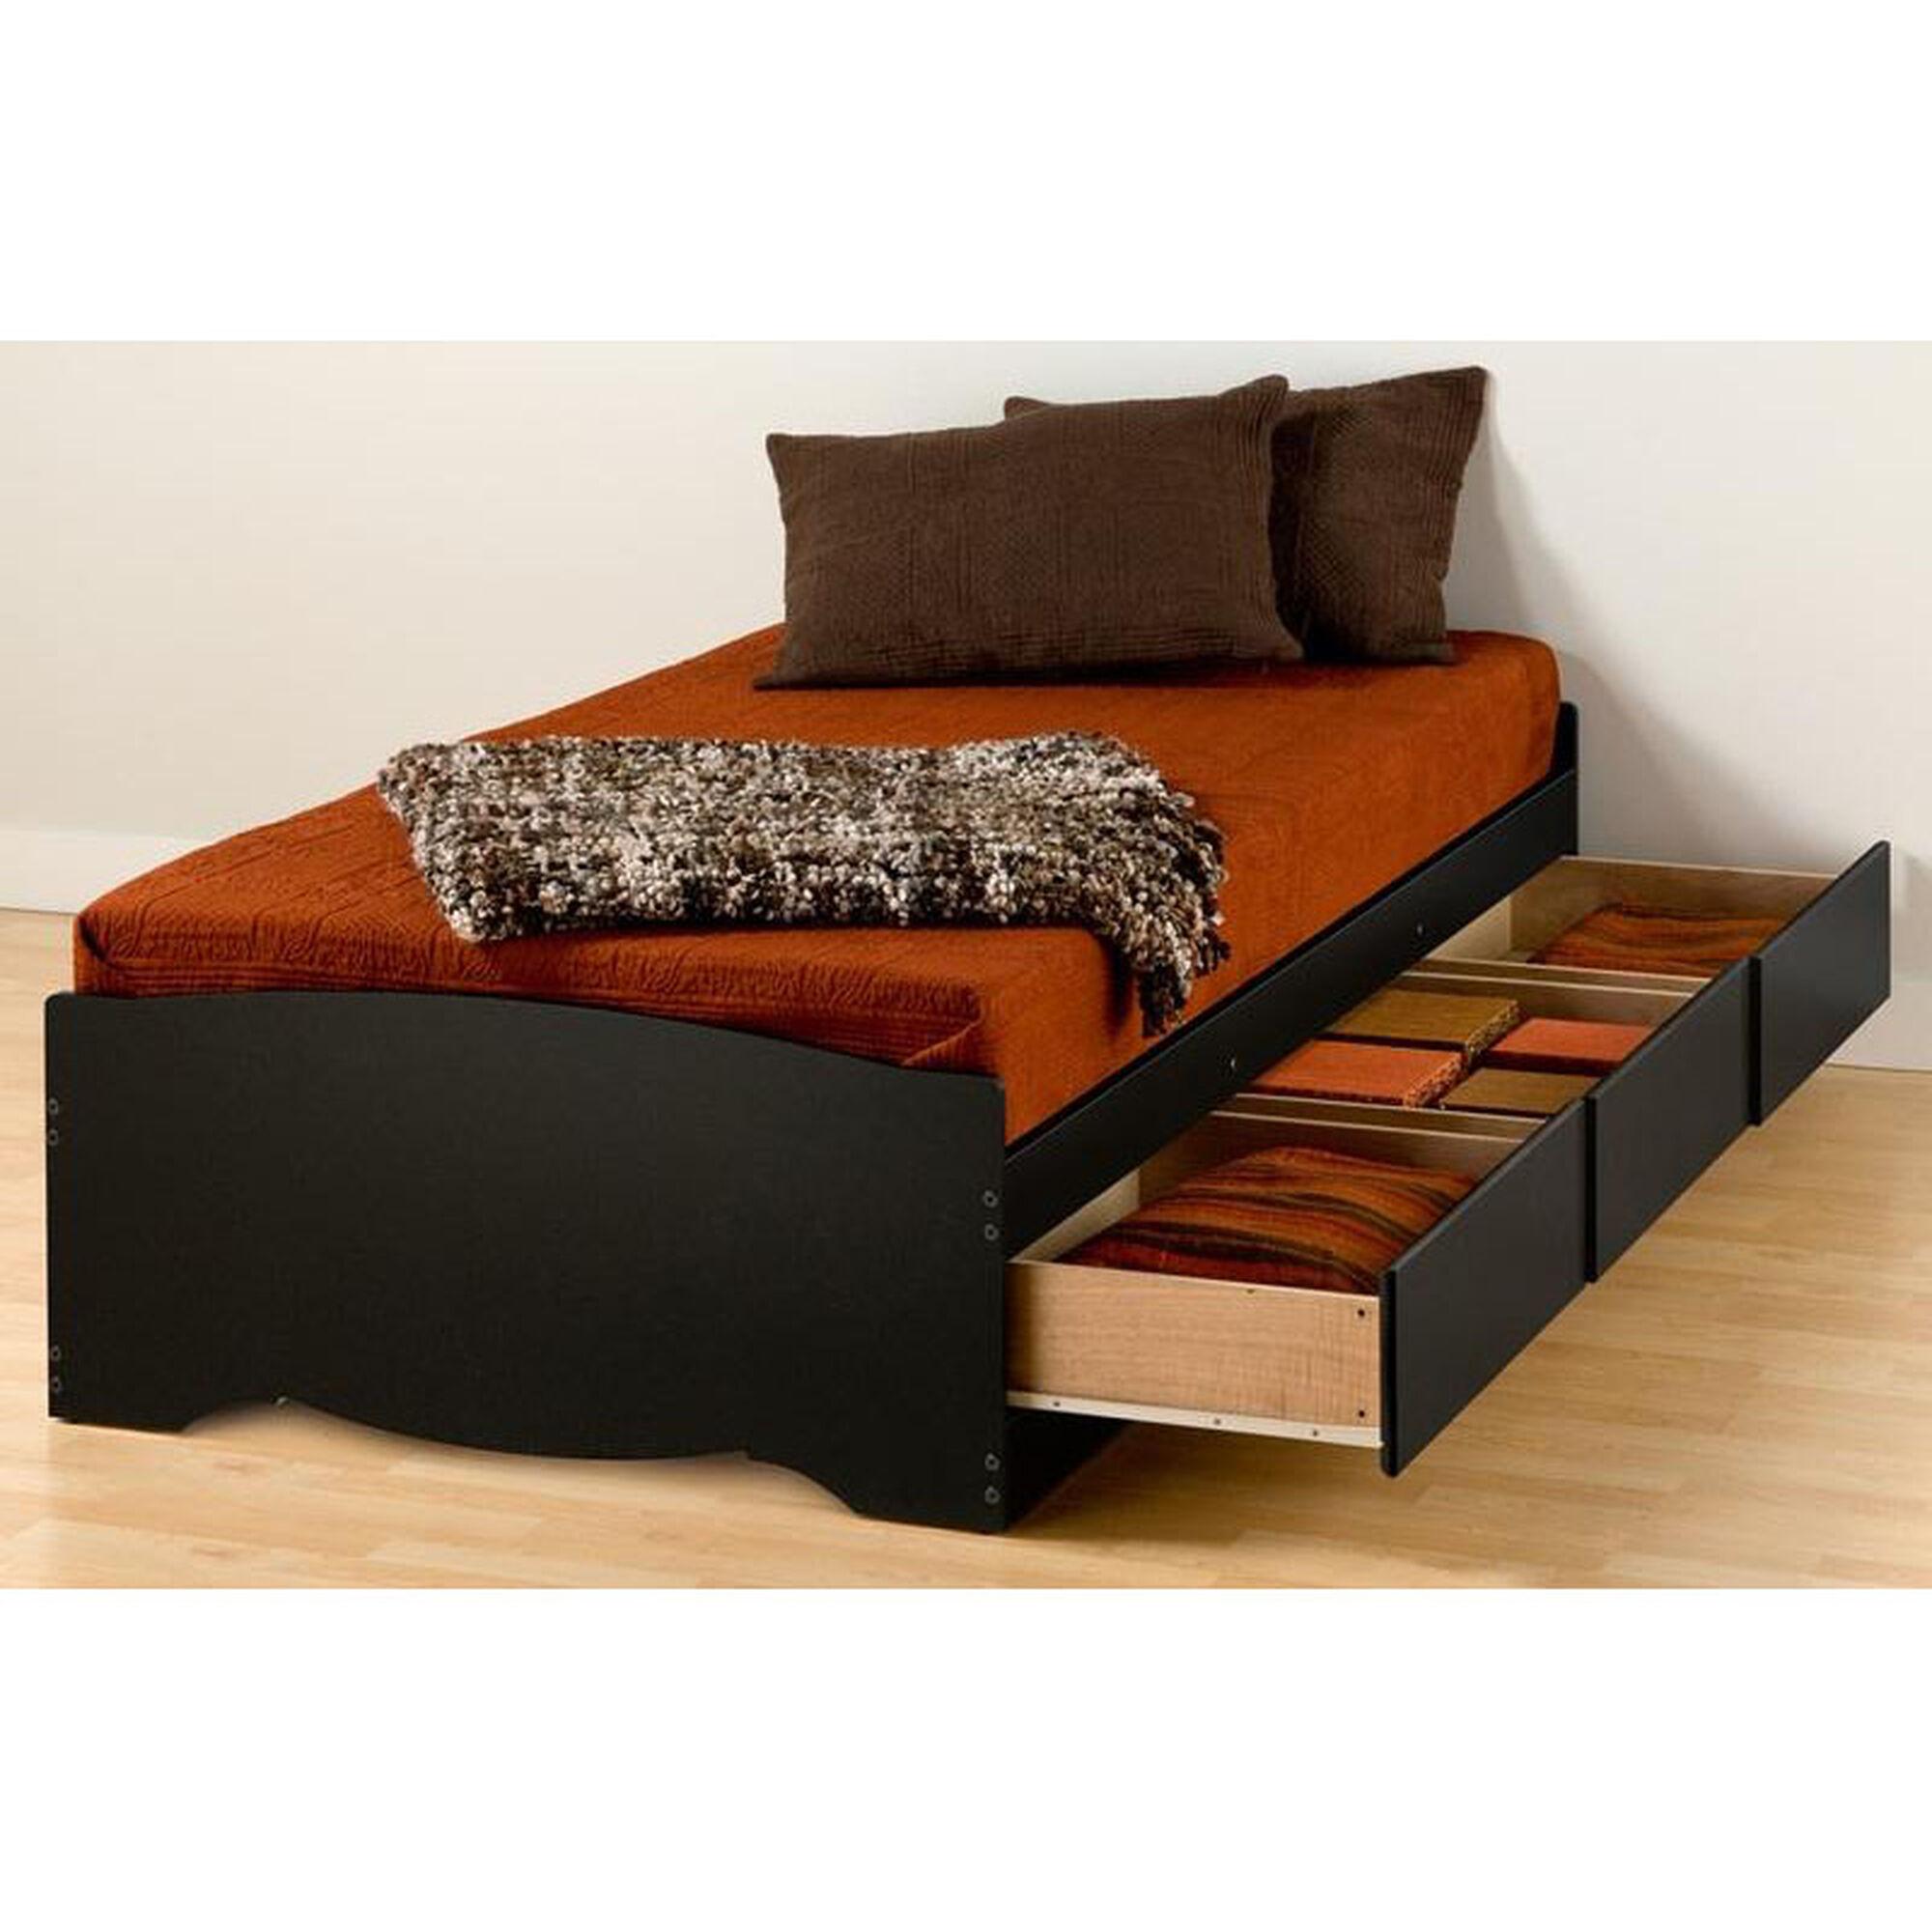 Platform Storage Bed Twin Xl Bbx 4105 K Bizchaircom